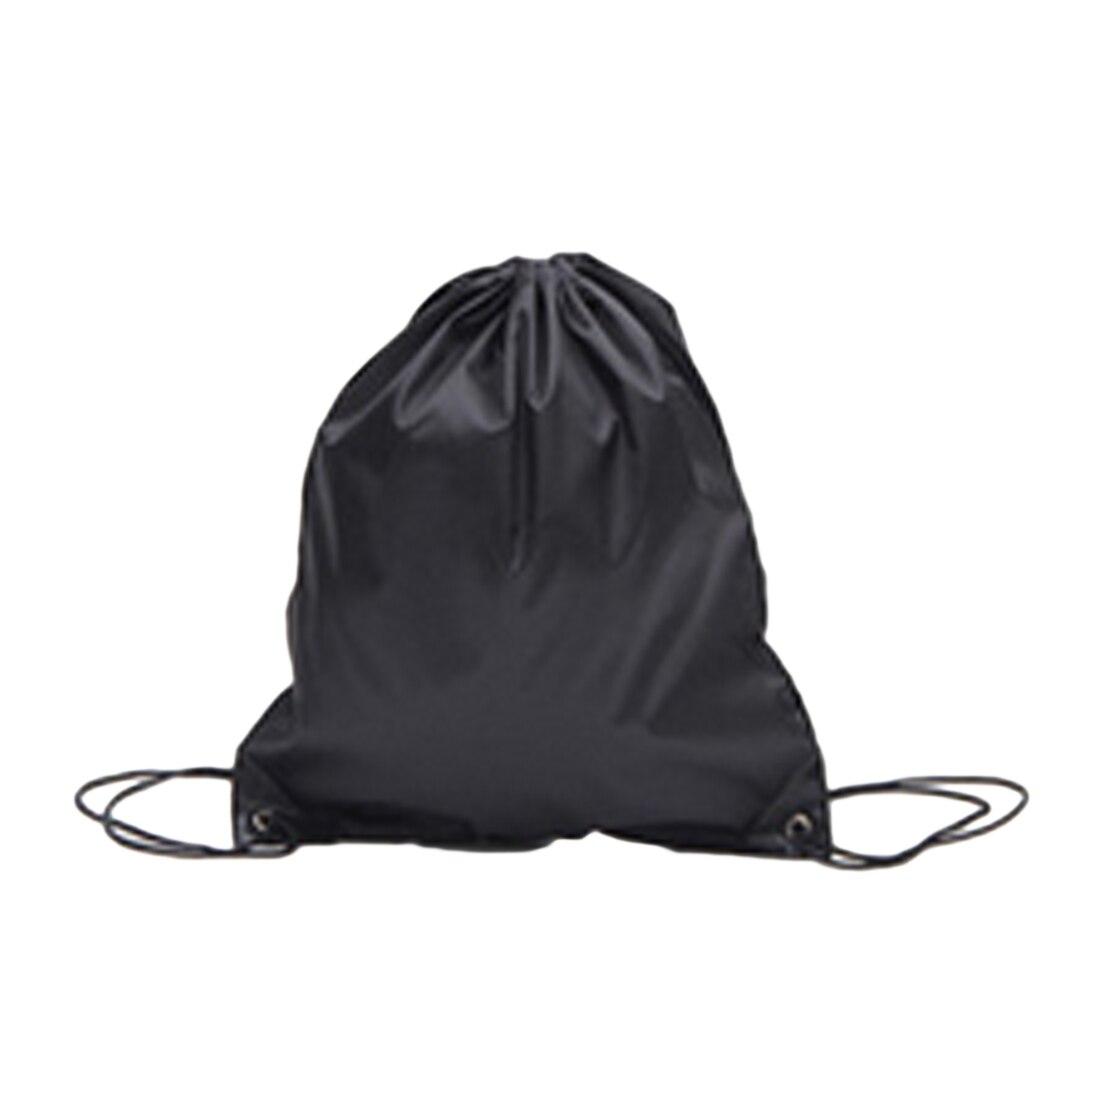 Swimwear /& gym bags School sports Drawstring Bags T print Blue colour